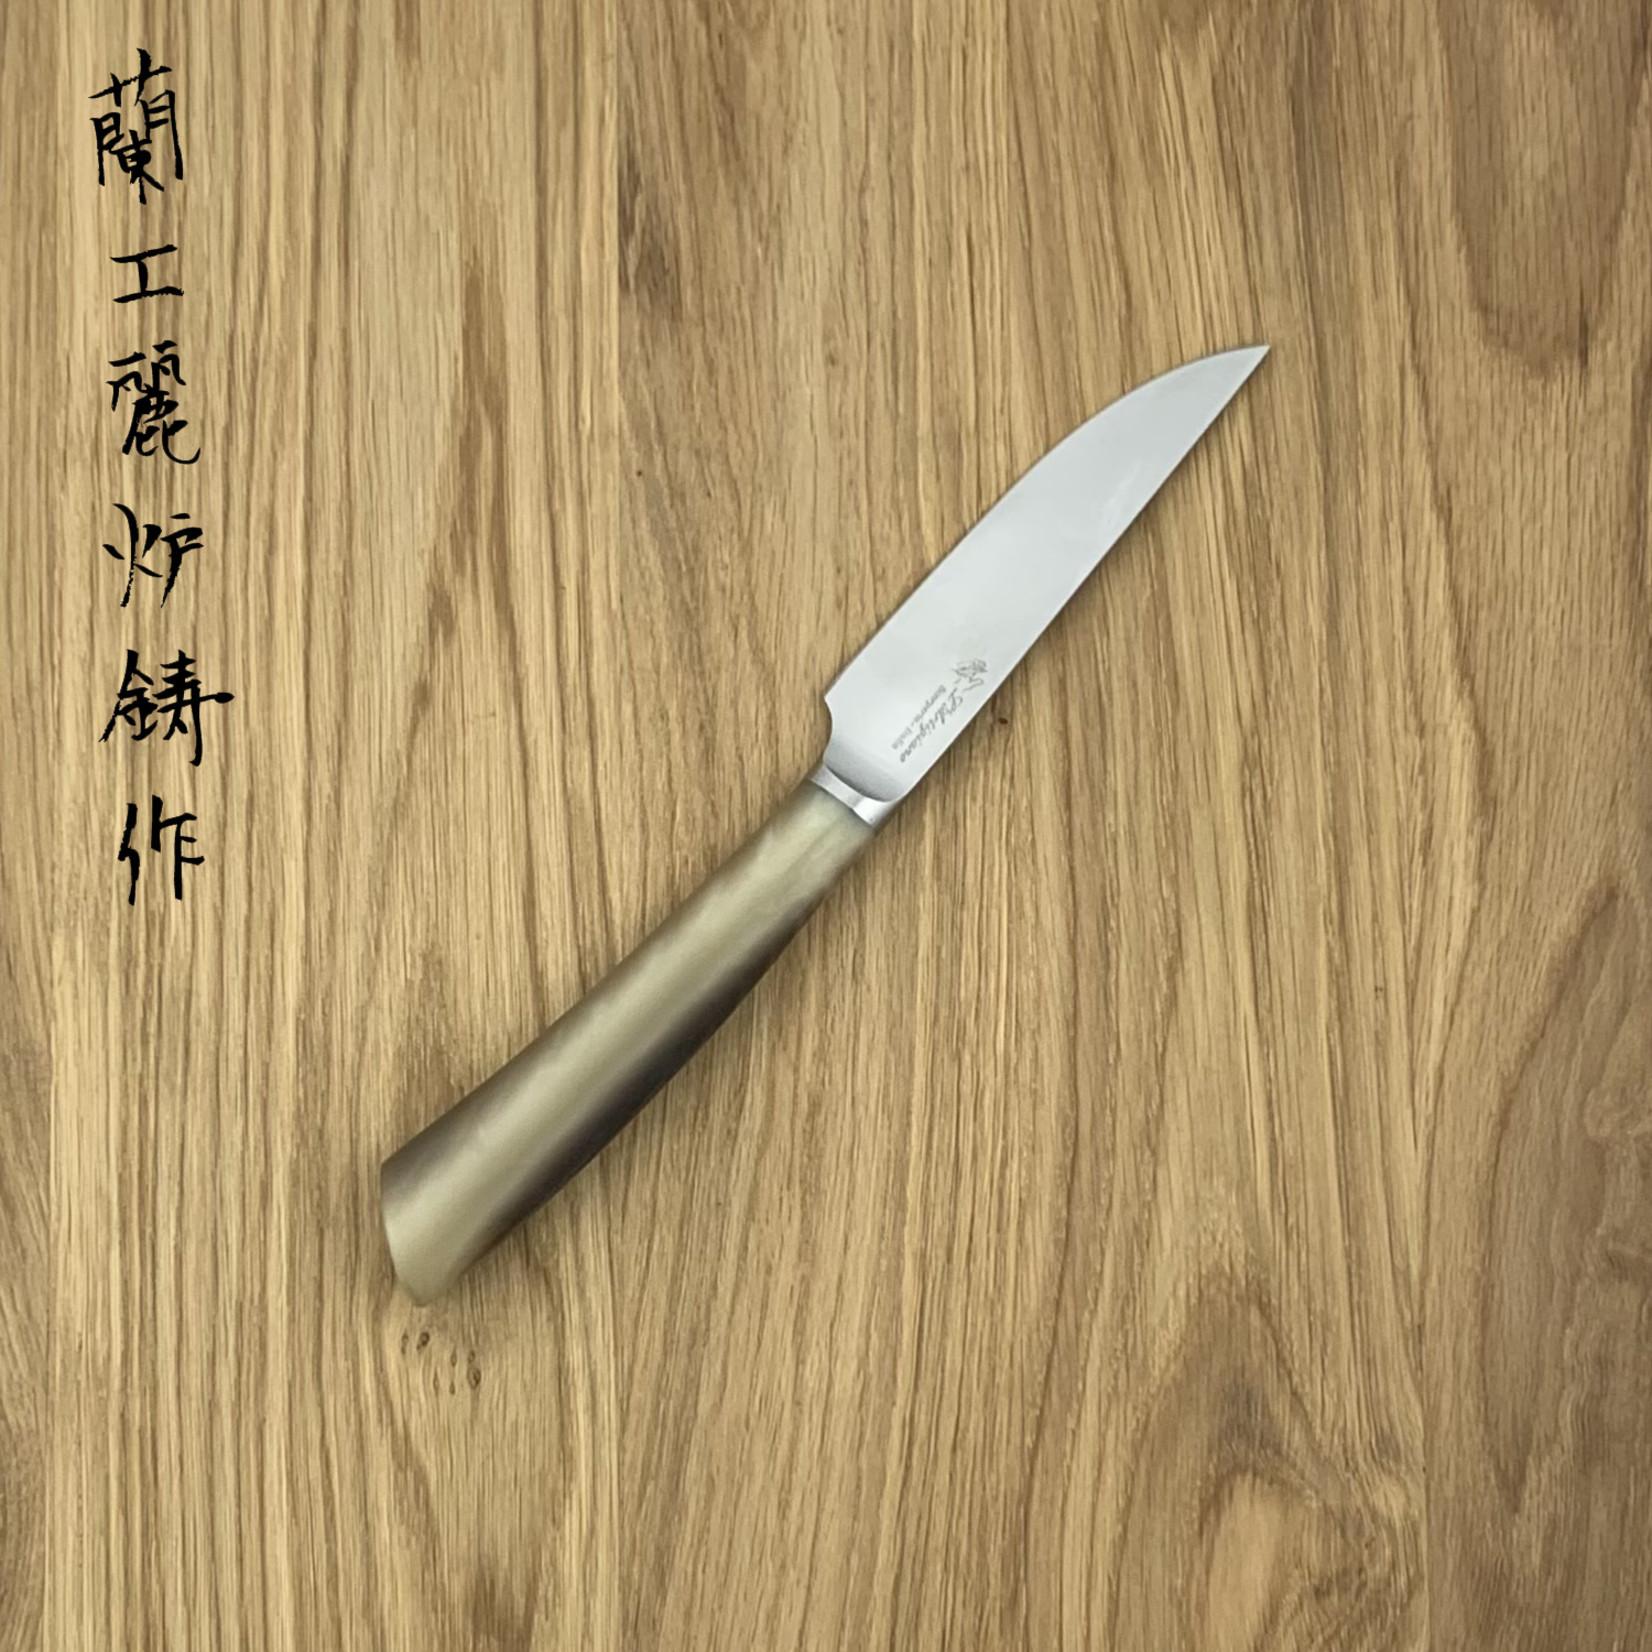 L'ARTIGIANO SCARPERIA Rustico steak knife imitation horn